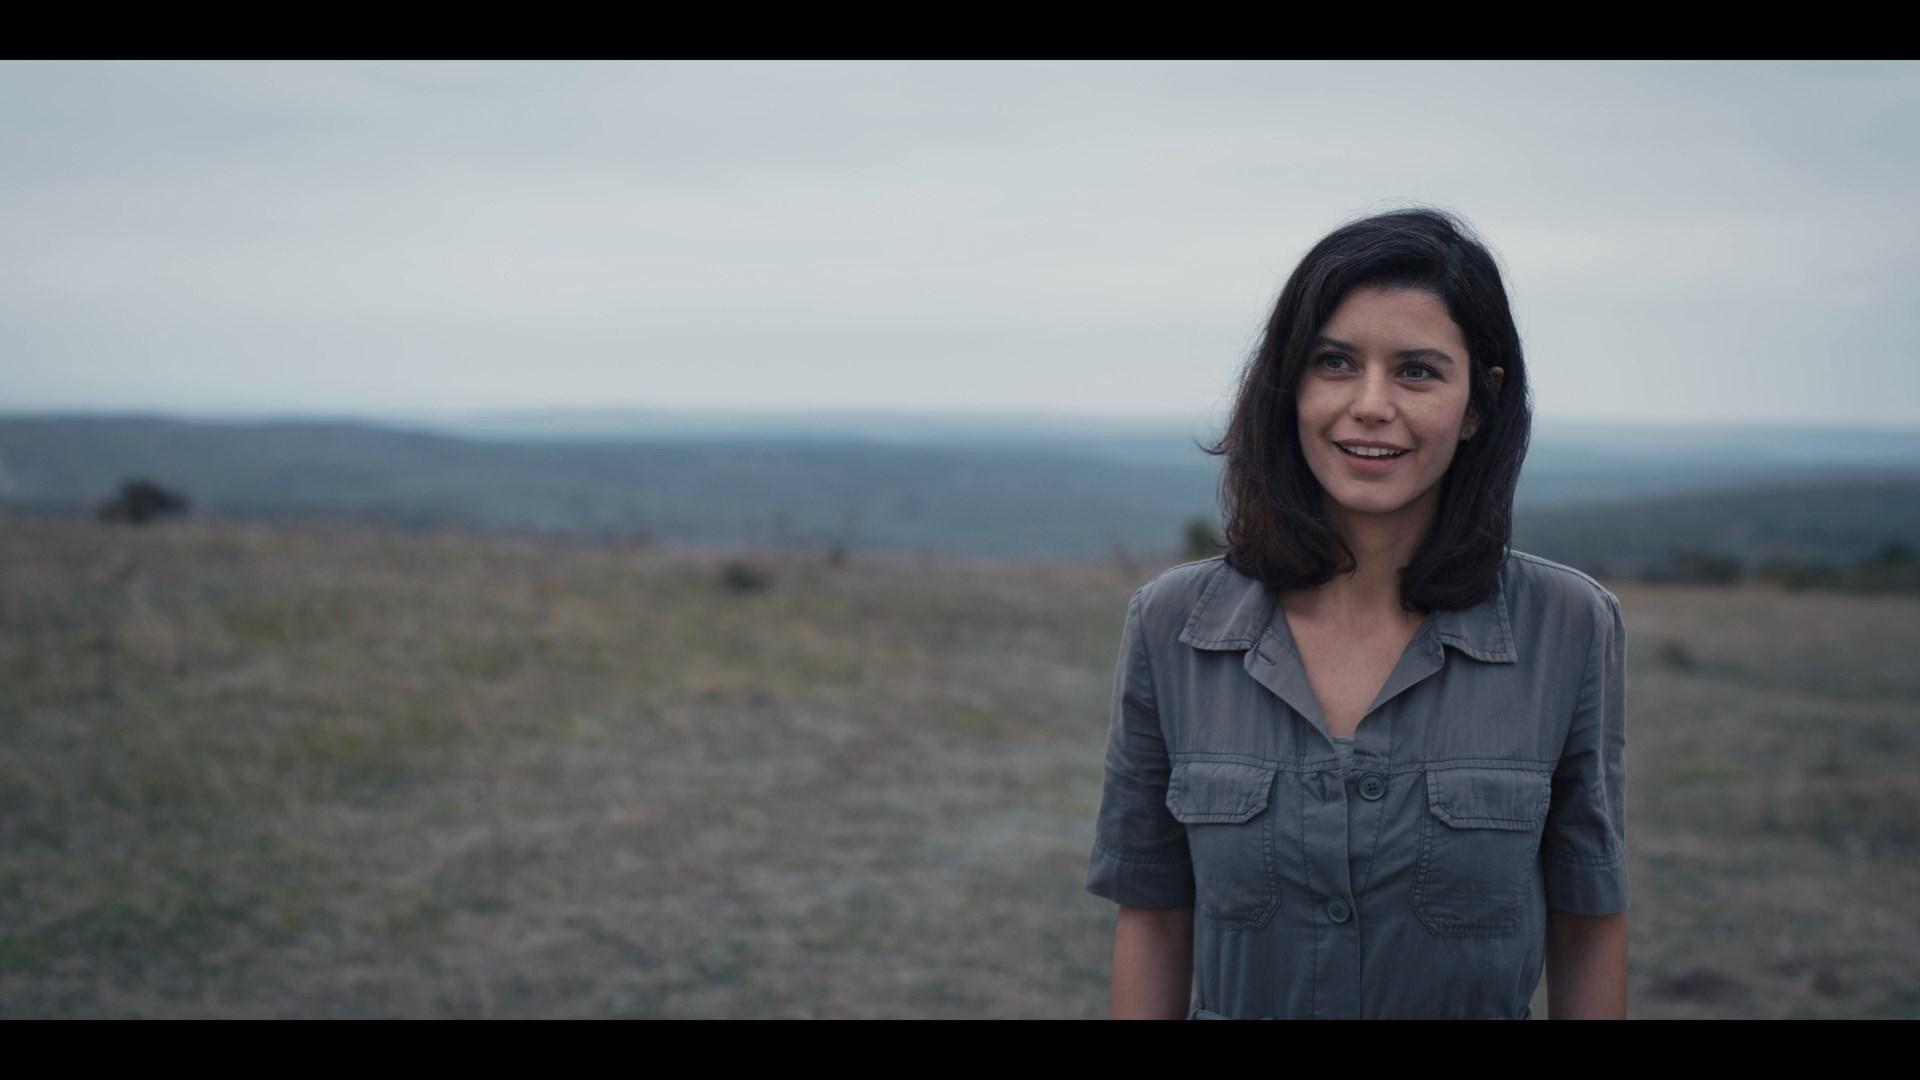 The Gift (2020) Temporada 2 1080p WEB-DL Latino - Turco - Ingles